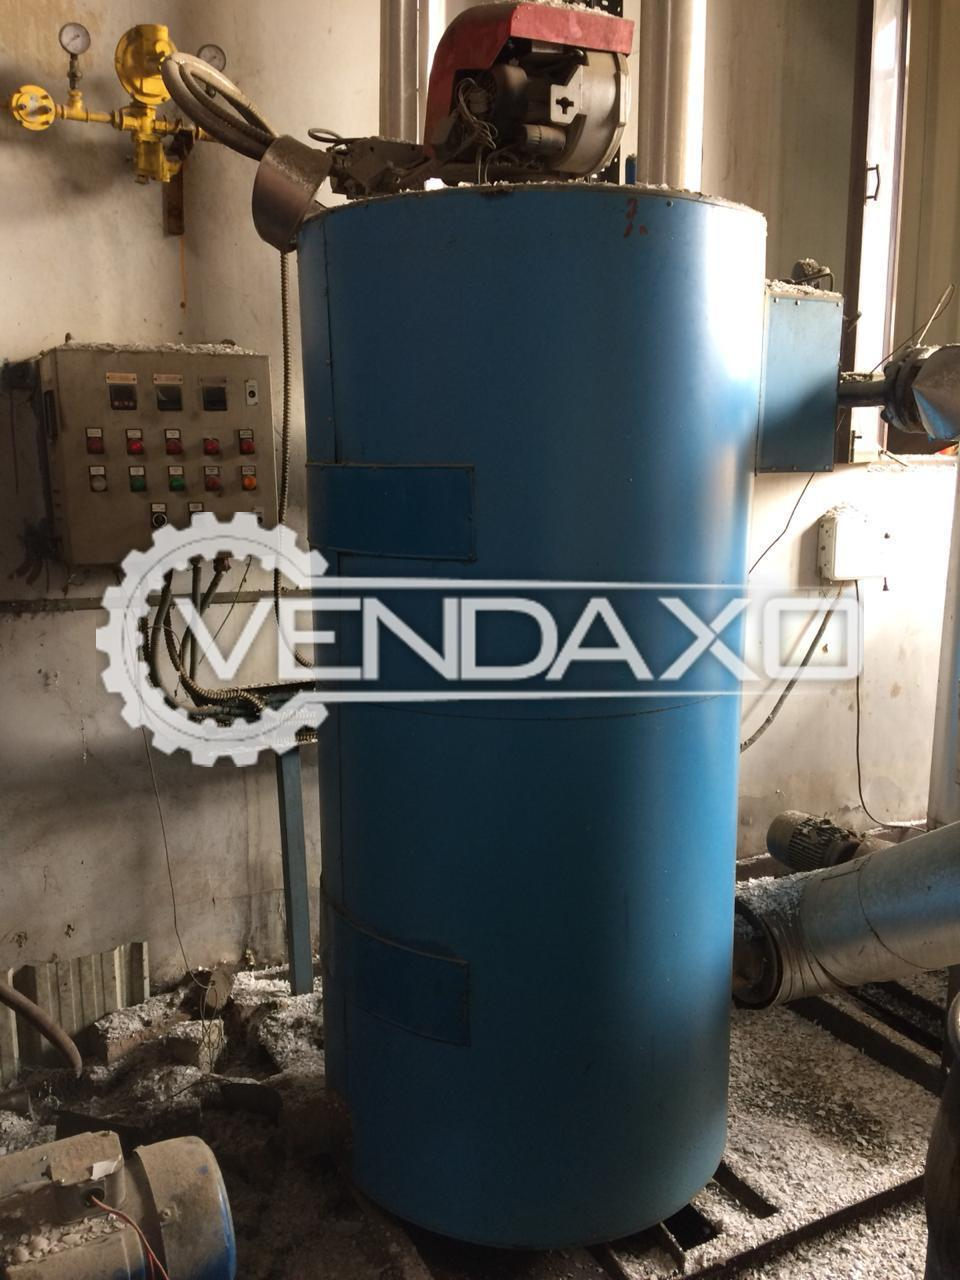 Thermax Make Thermopac Gas Boiler - 1 Lac Kcal